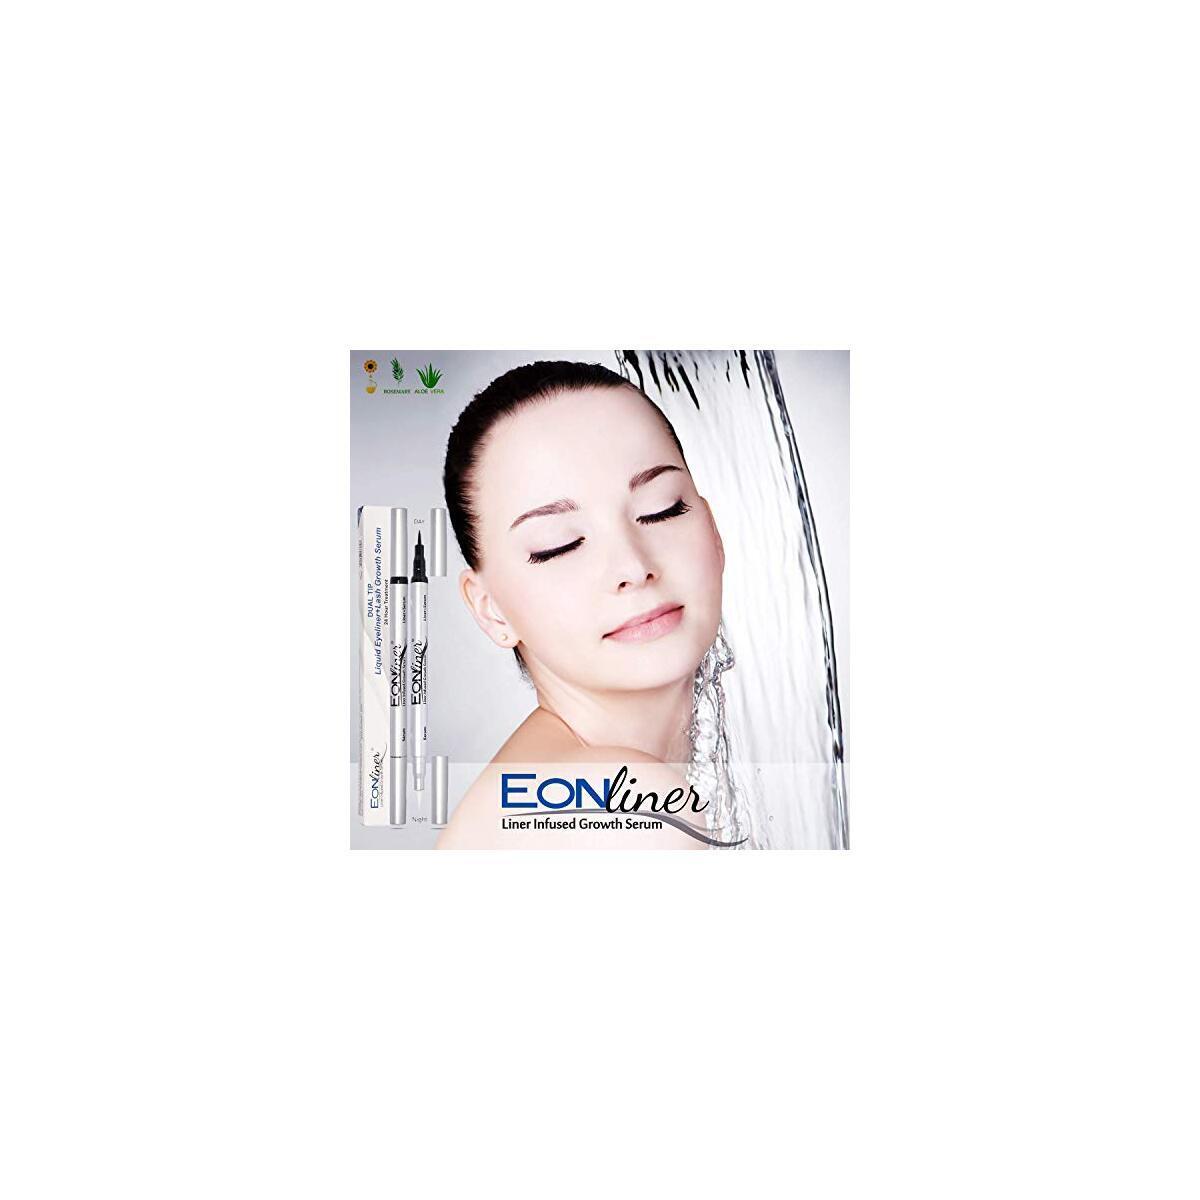 Dual Tip Liquid Eyeliner and Eyebrow Enhancer - Long Lasting   Super Slim   Ultra-Fine Felt Tip Liquid Pen Waterproof Smudge Proof Perfect Makeup, Quick Drying Formula with Eyelash Growth Serum